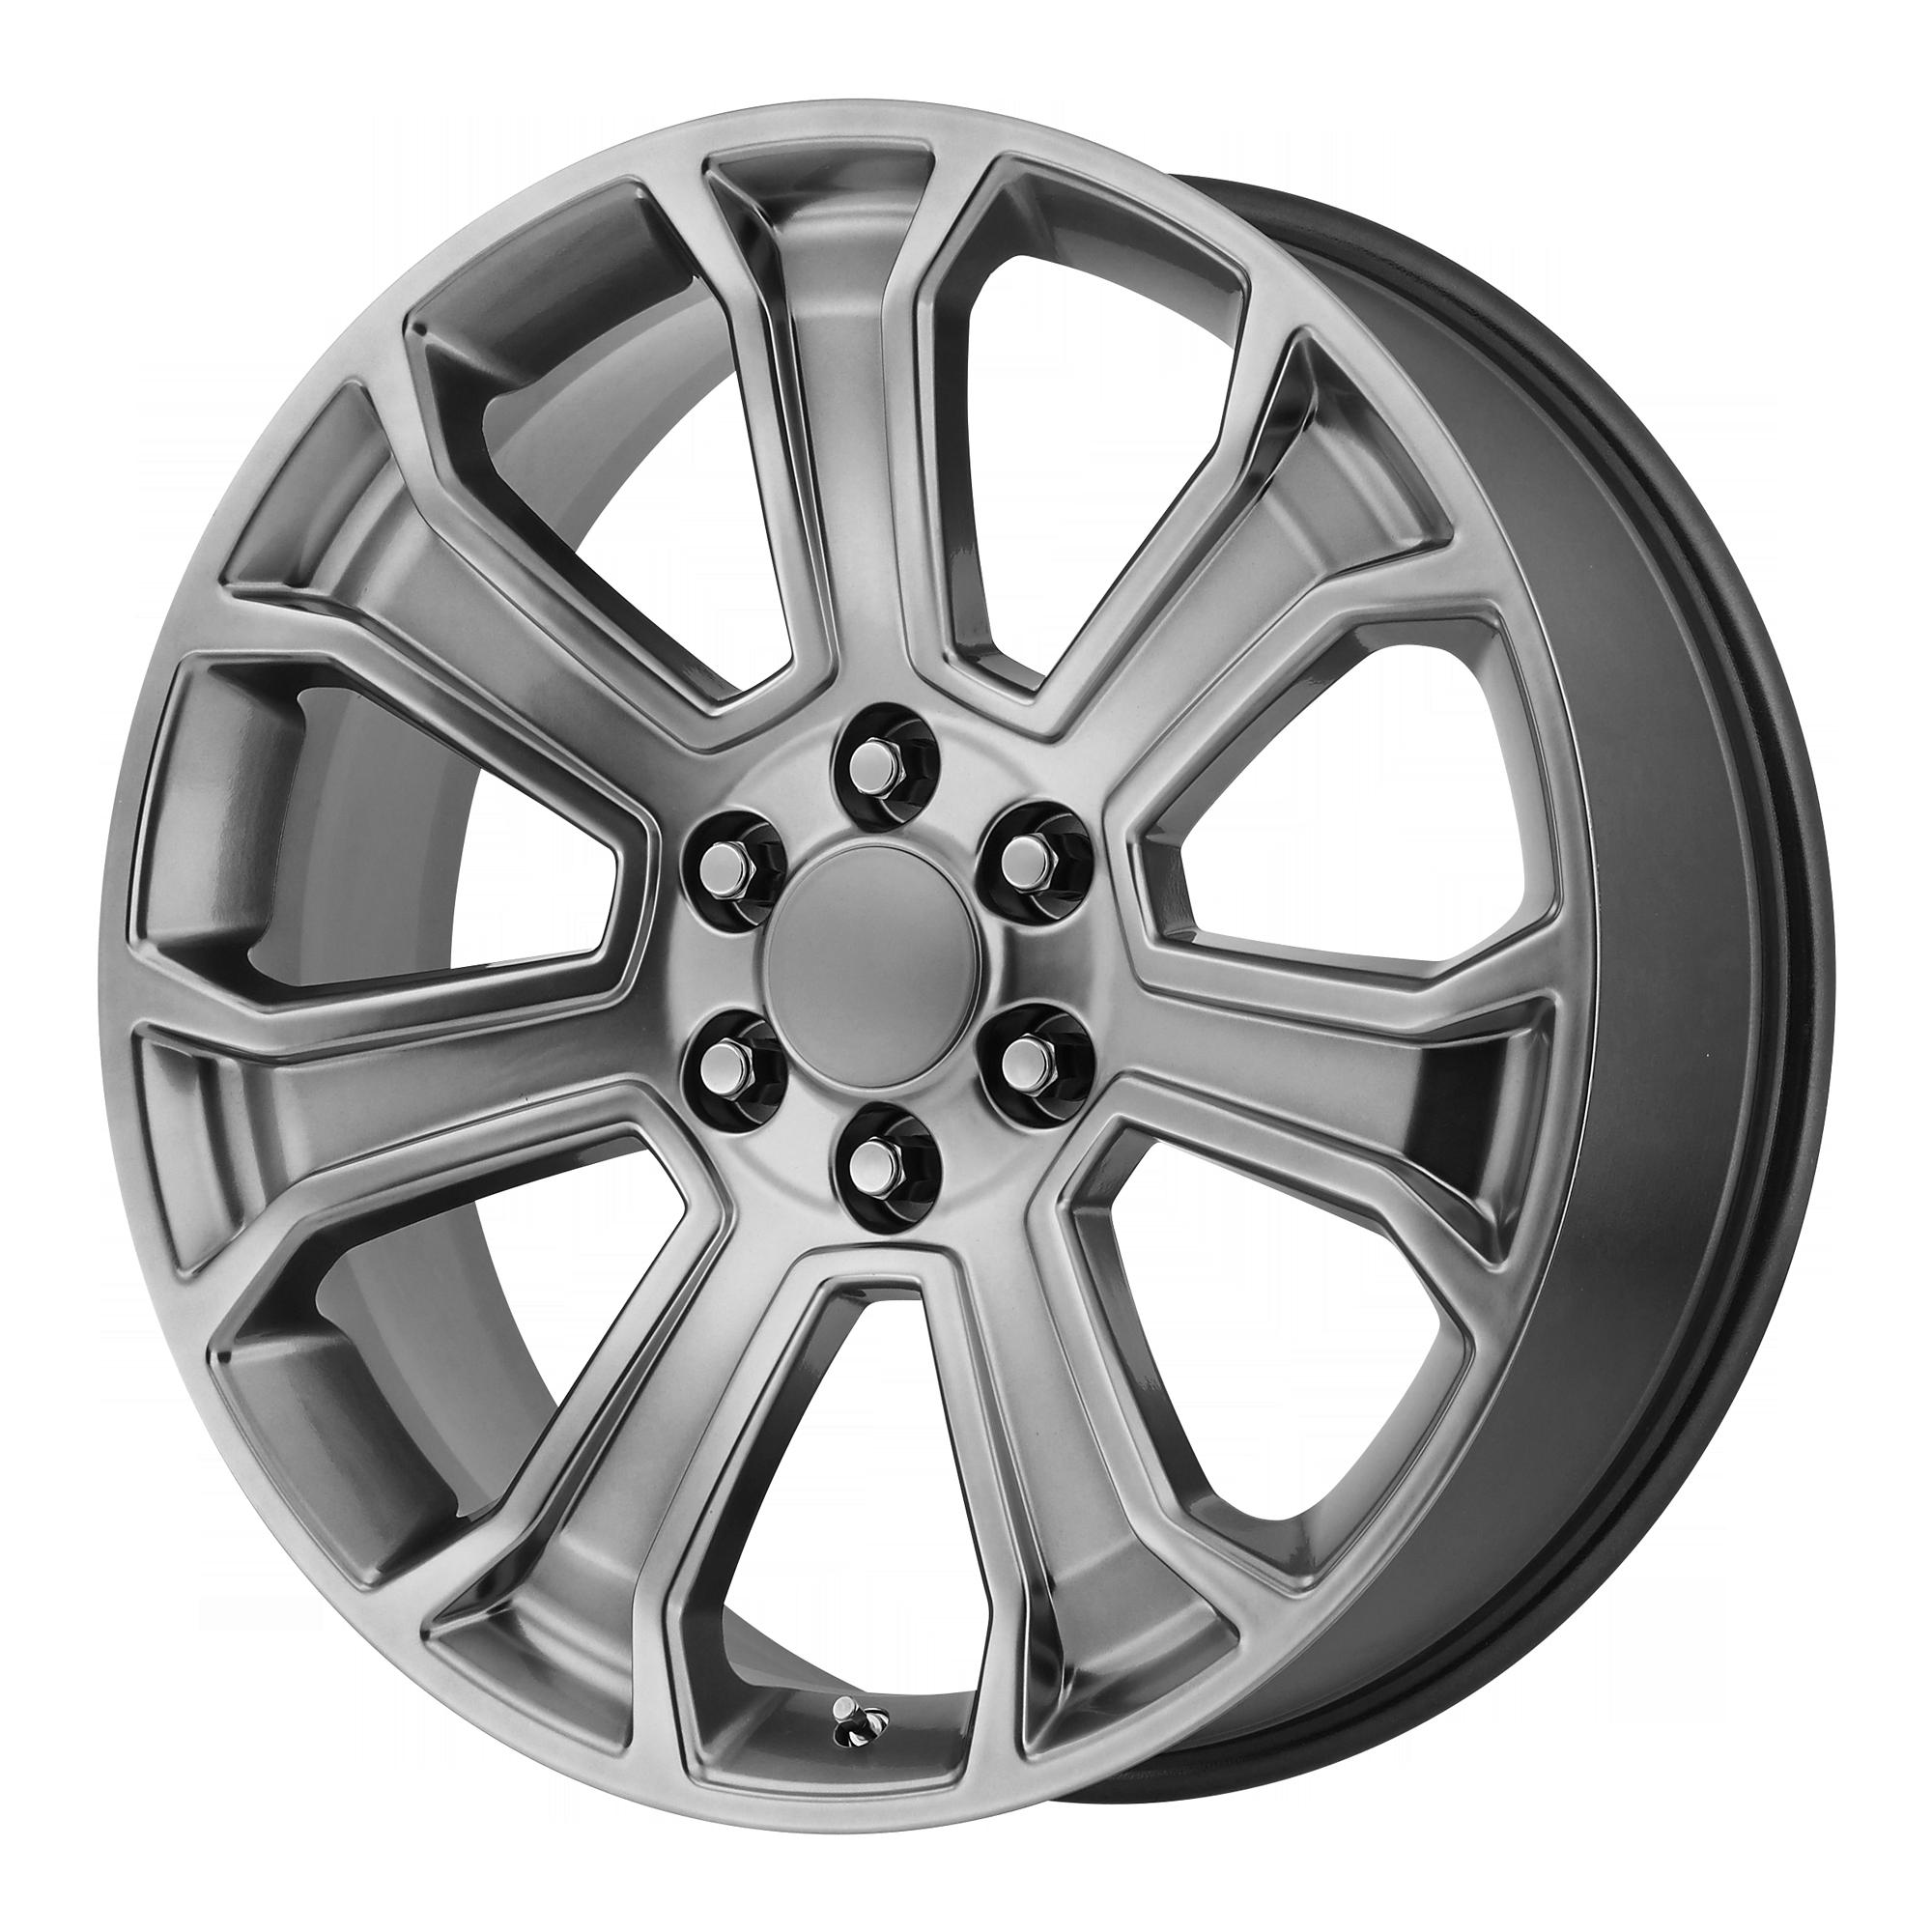 OE Creations Replica Wheels OE Creations PR166 Hyper Silver